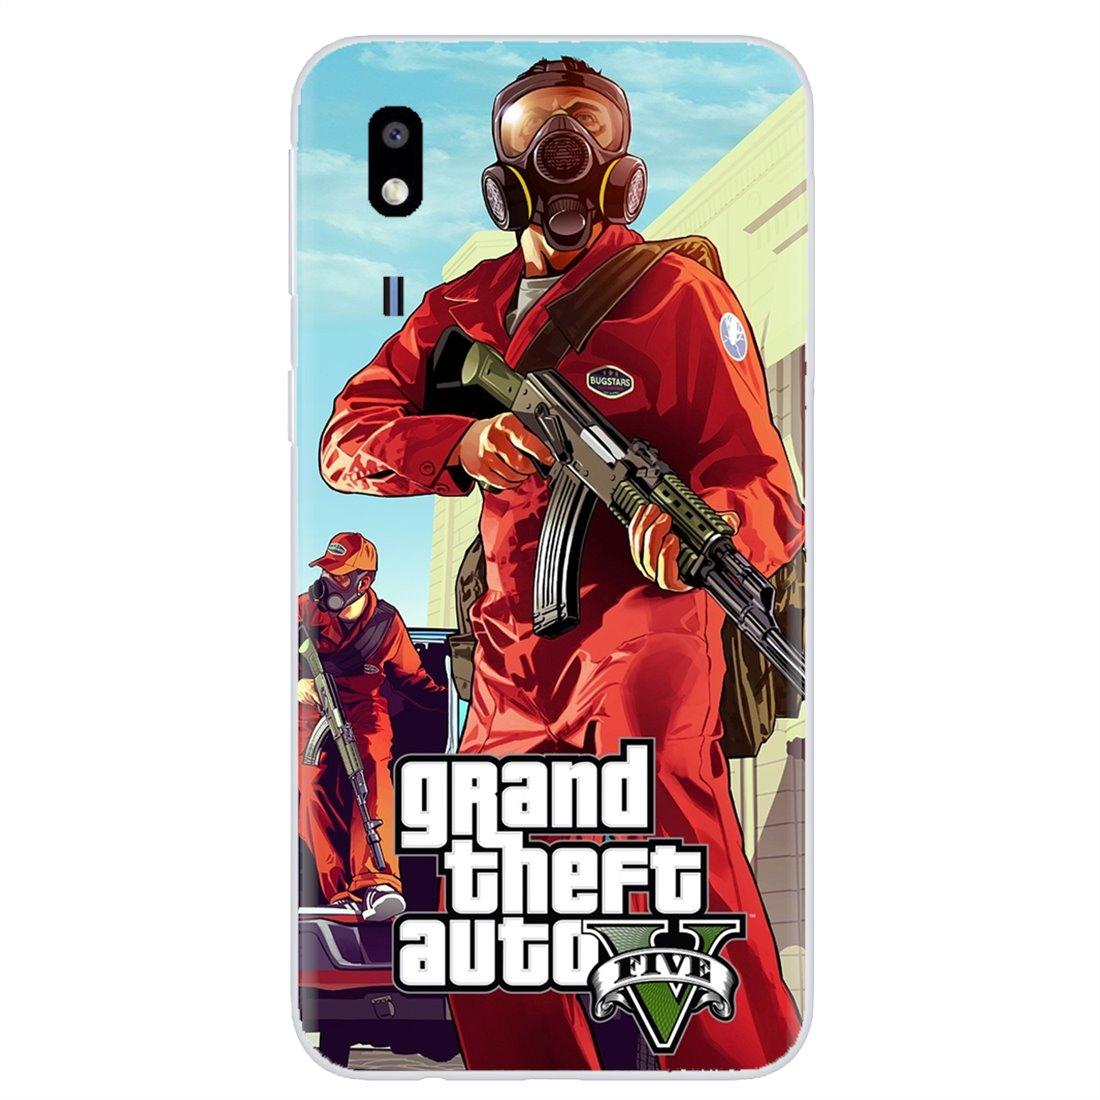 Personalizado caja del teléfono de silicona para Samsung Galaxy J1 J2 J3 J4 J5 J6 J7 J8 Plus 2018 primer 2015 de 2016 2017 GTA Grand Theft Auto